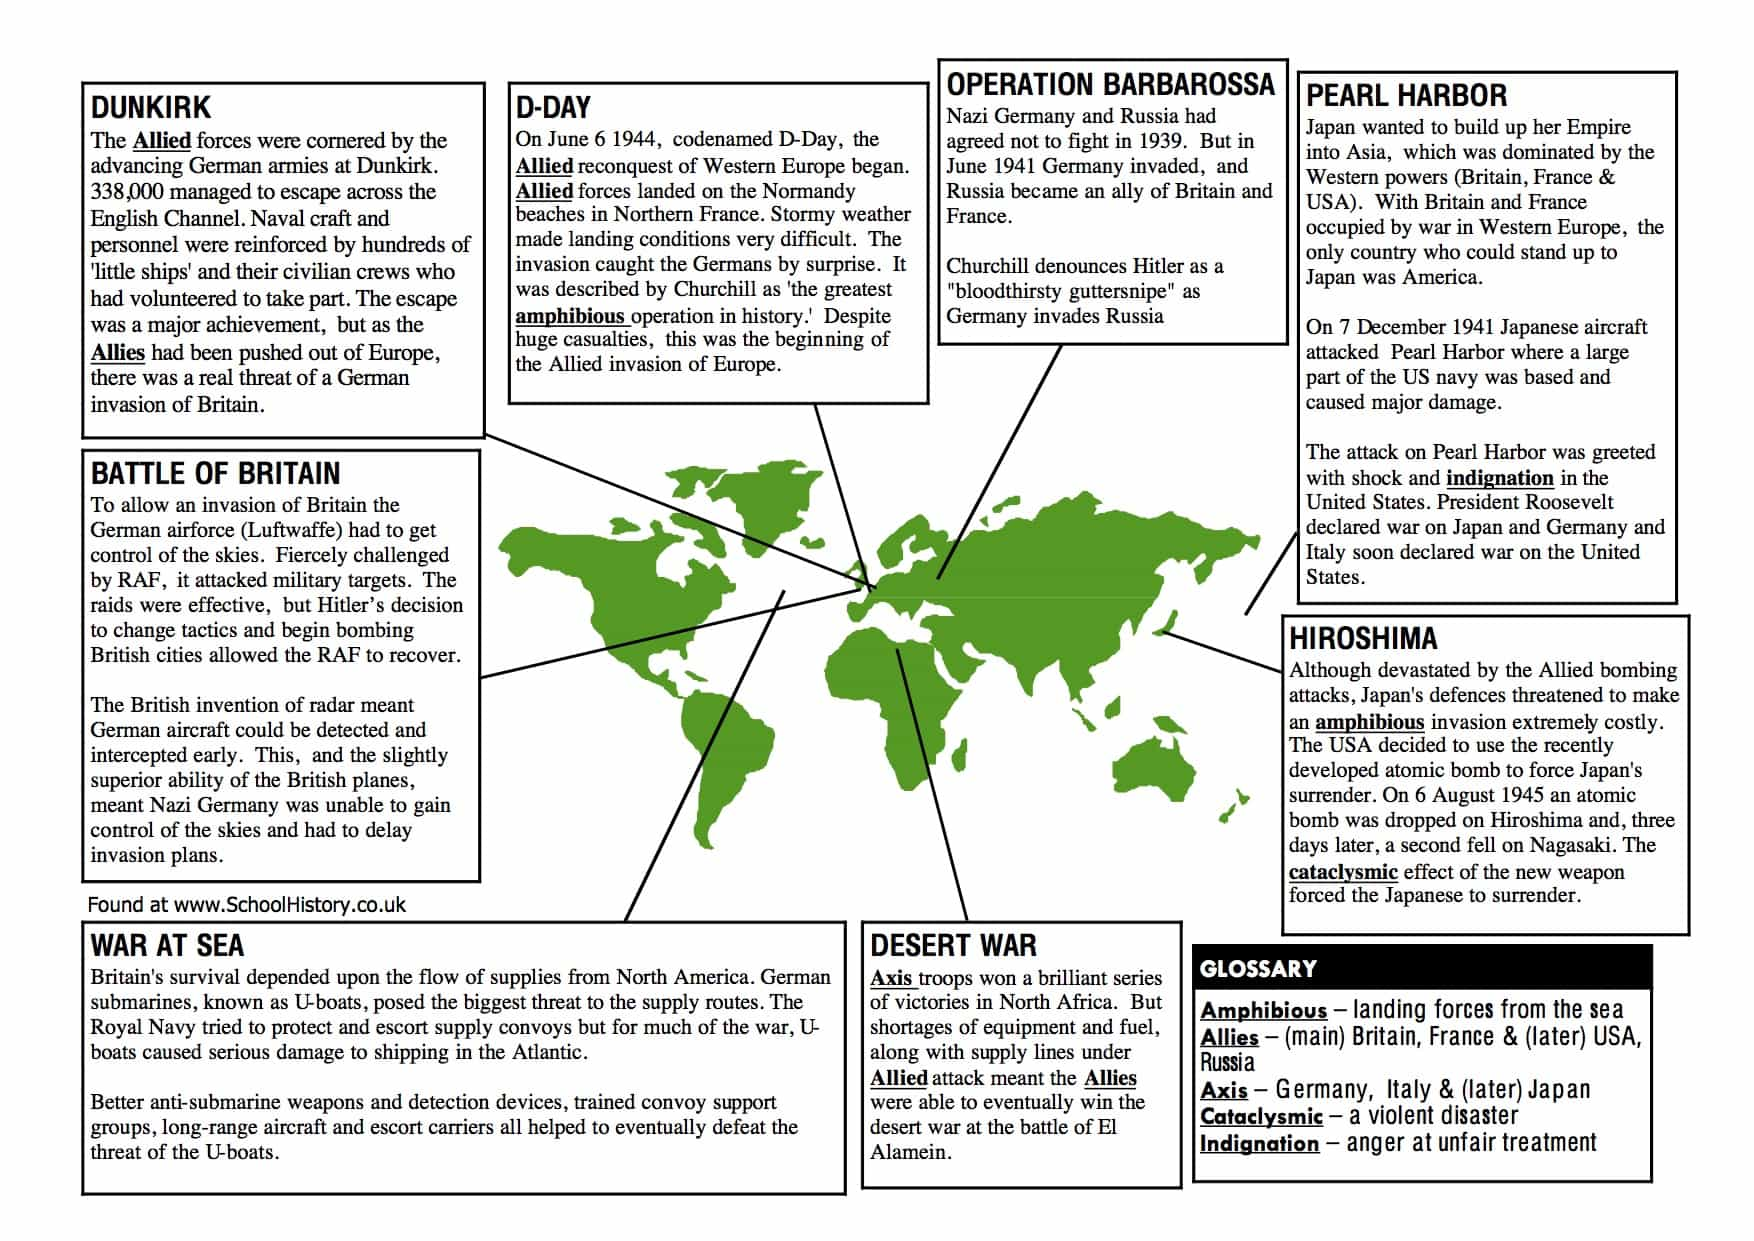 Key Events Of World War 2 Facts Information Worksheet